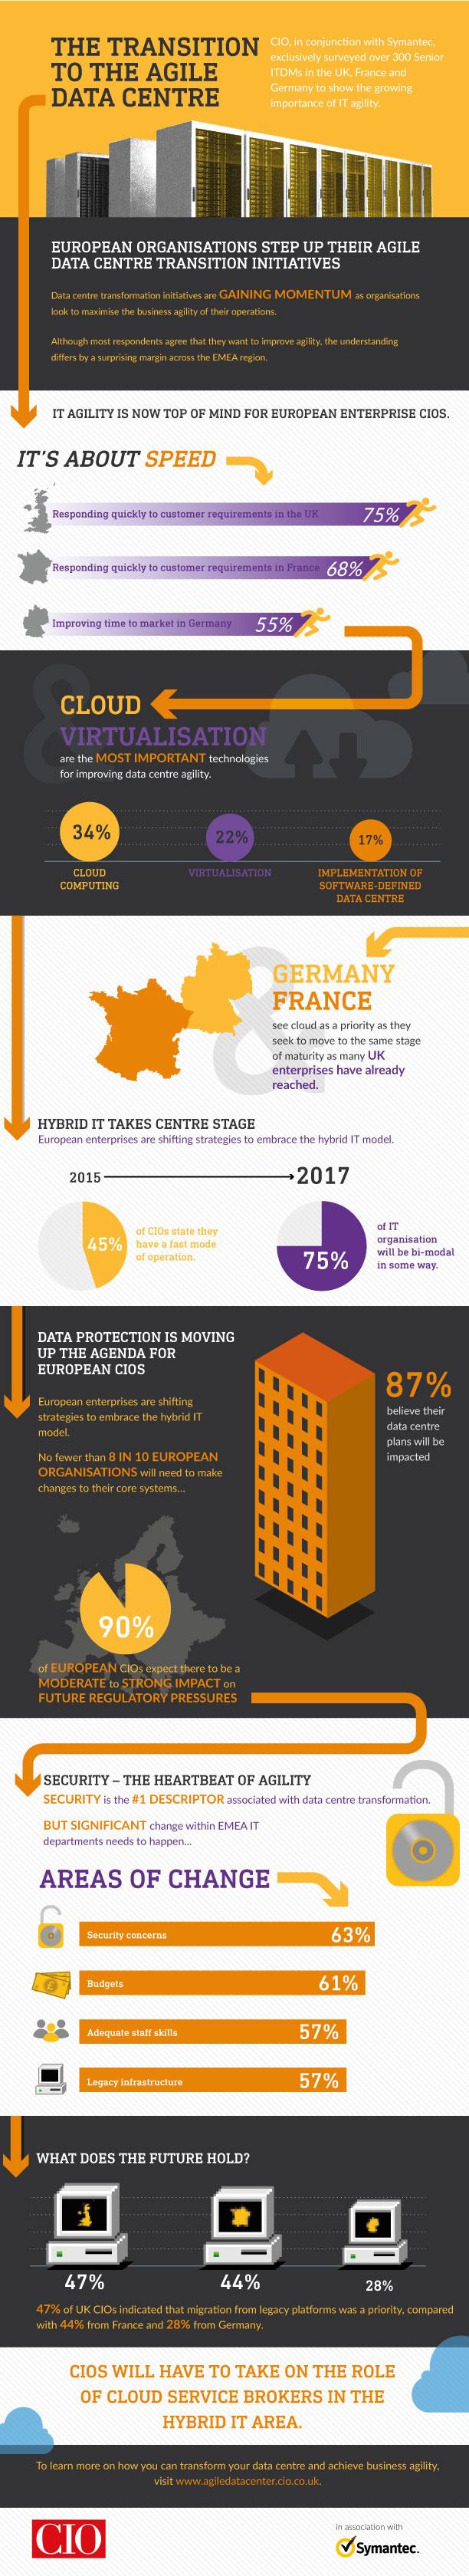 Symantec-Infographic.jpg